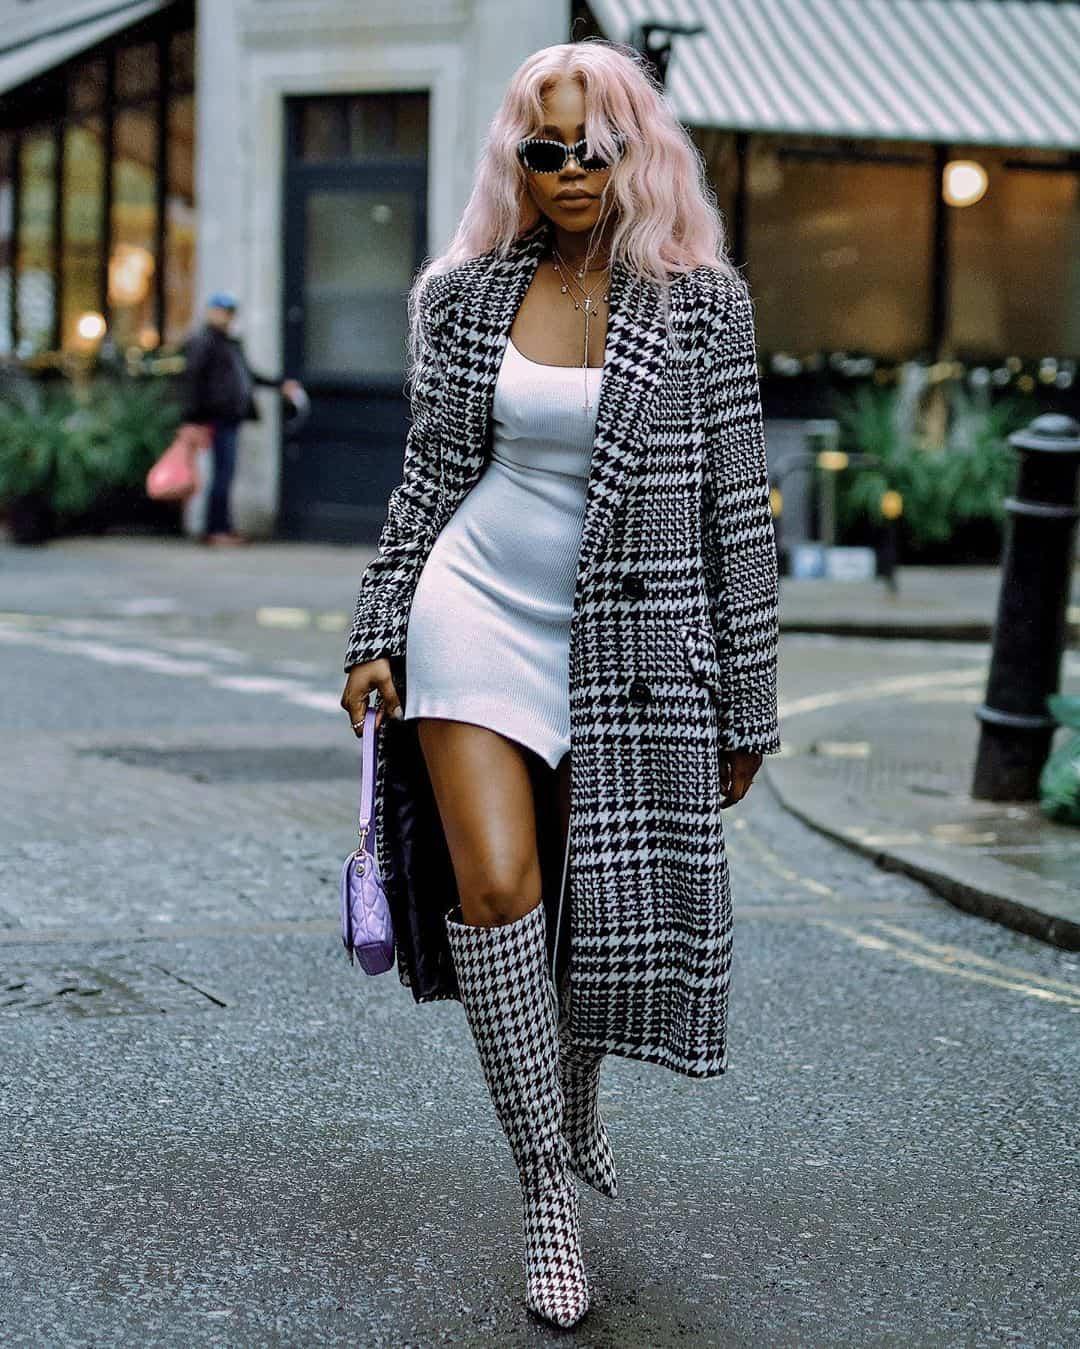 Juliette Foxx – Street Style 101 with Romeos Fashionfix